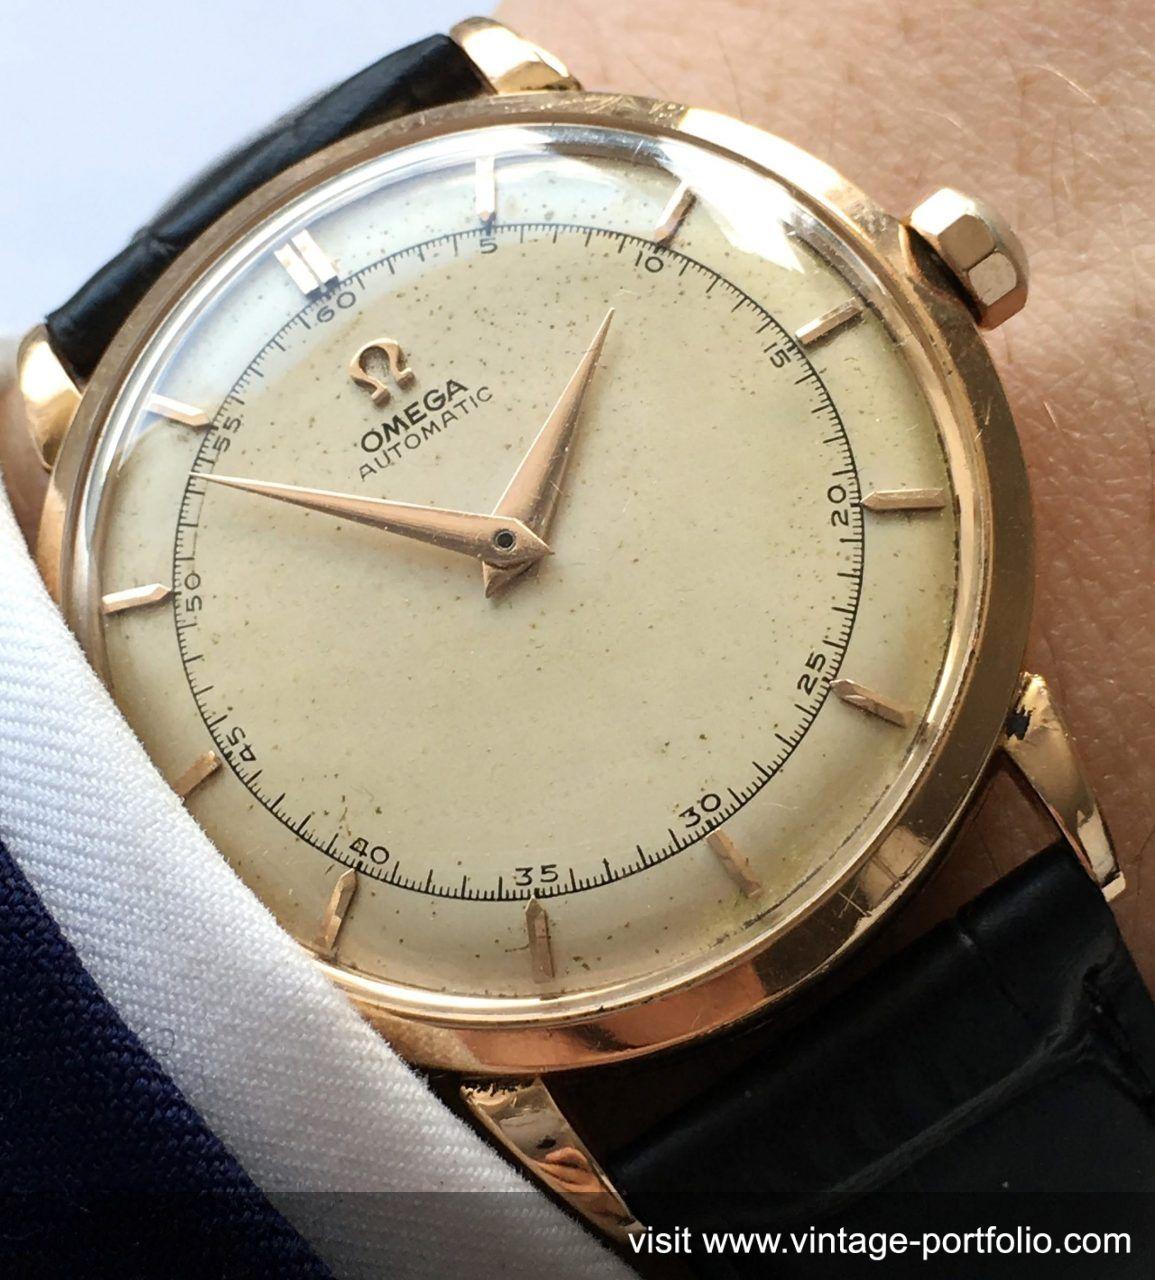 35mm pink gold omega bumper vintage automatic watches pinterest uhren herrenuhren und armband. Black Bedroom Furniture Sets. Home Design Ideas